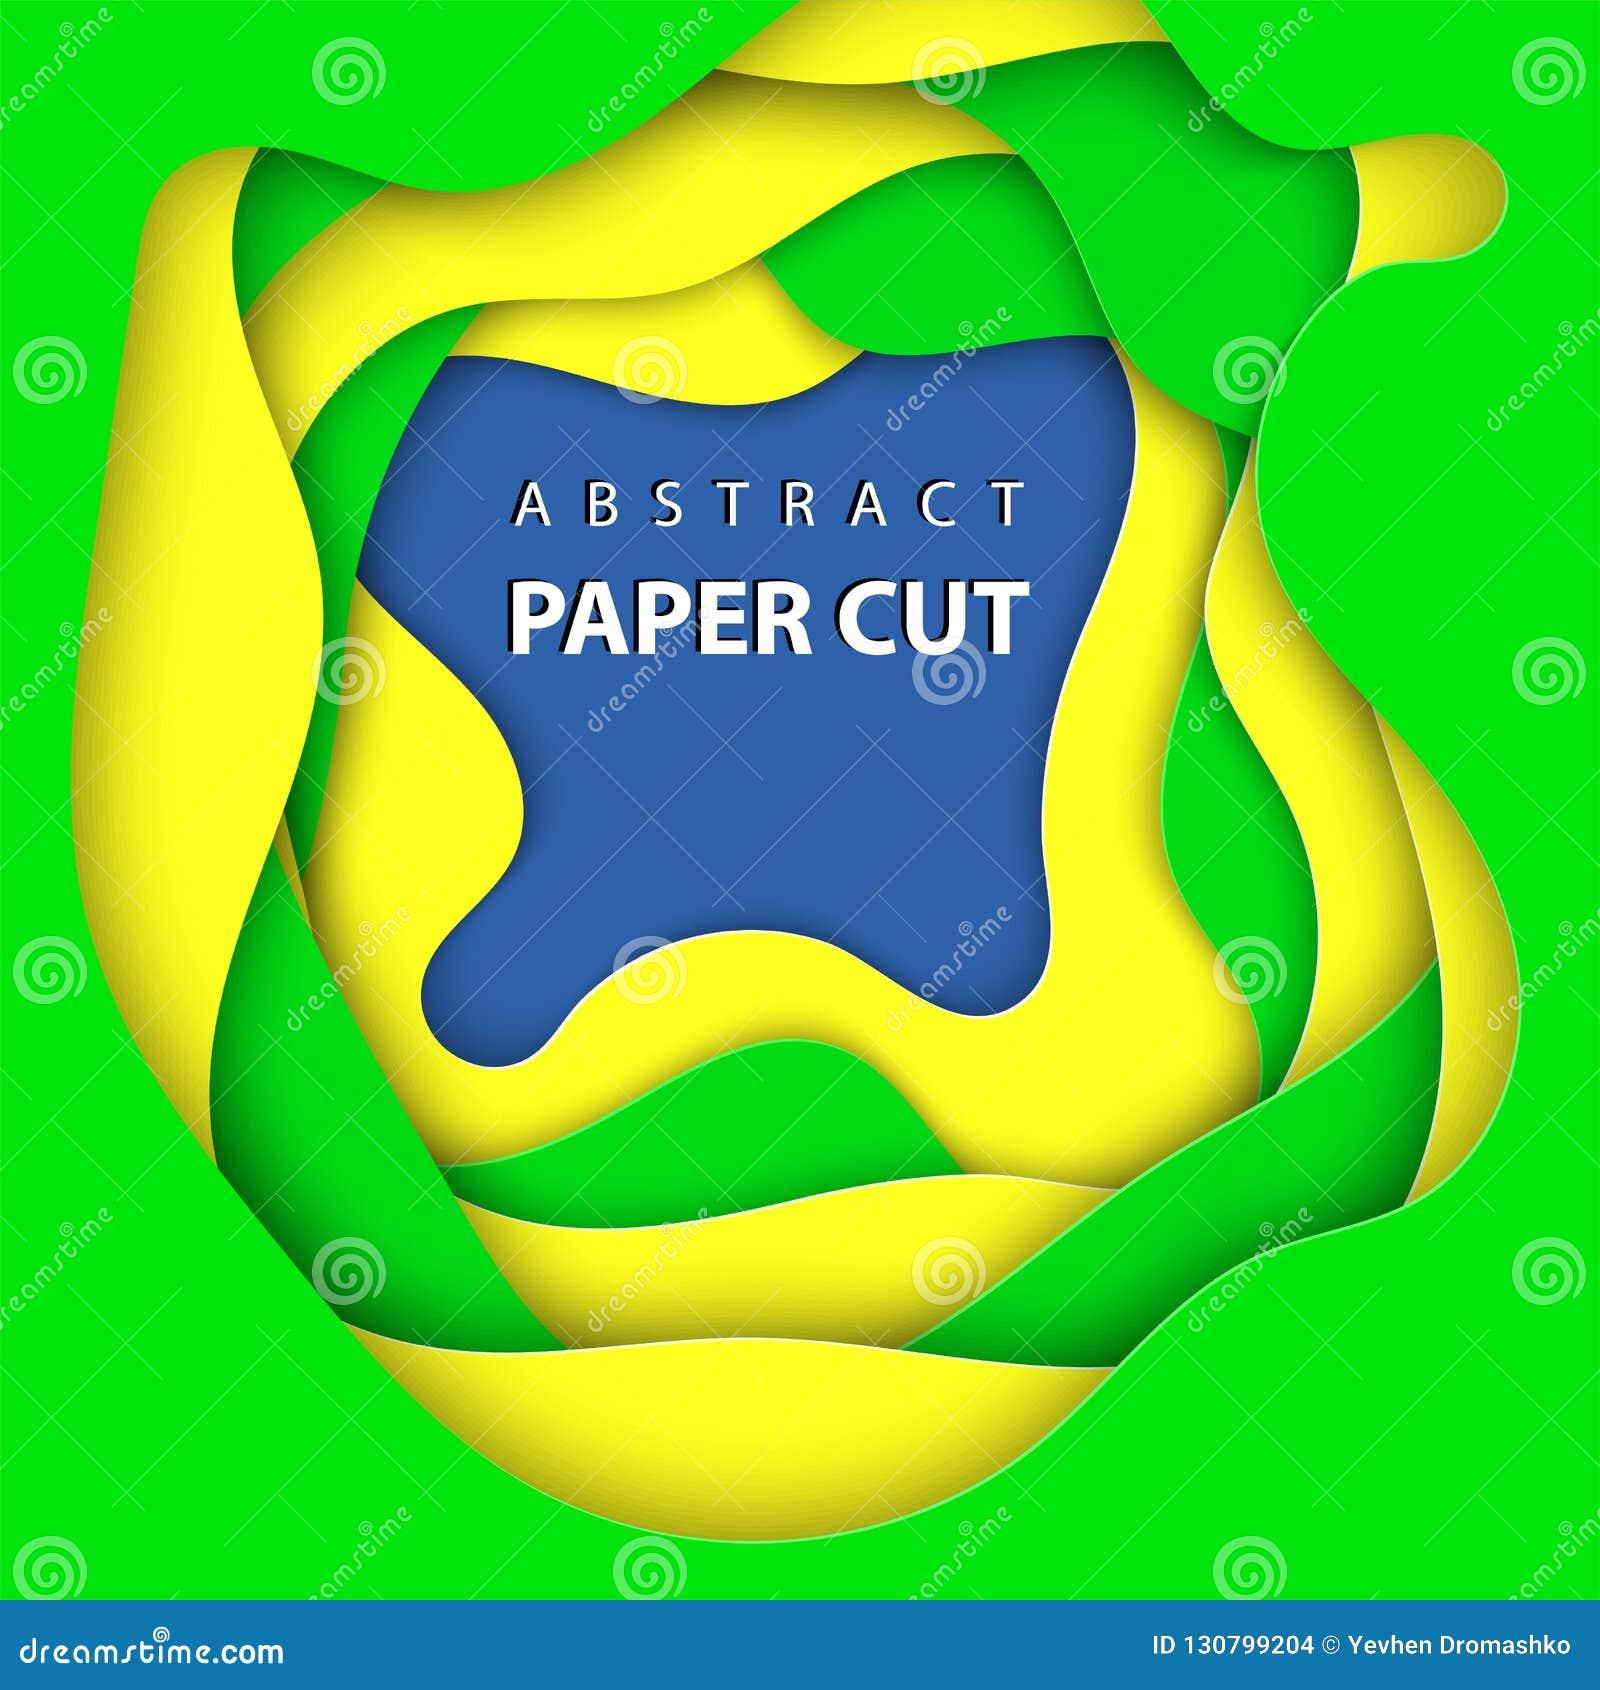 Fundo do vetor com formas brasileiras do corte do papel das cores da bandeira